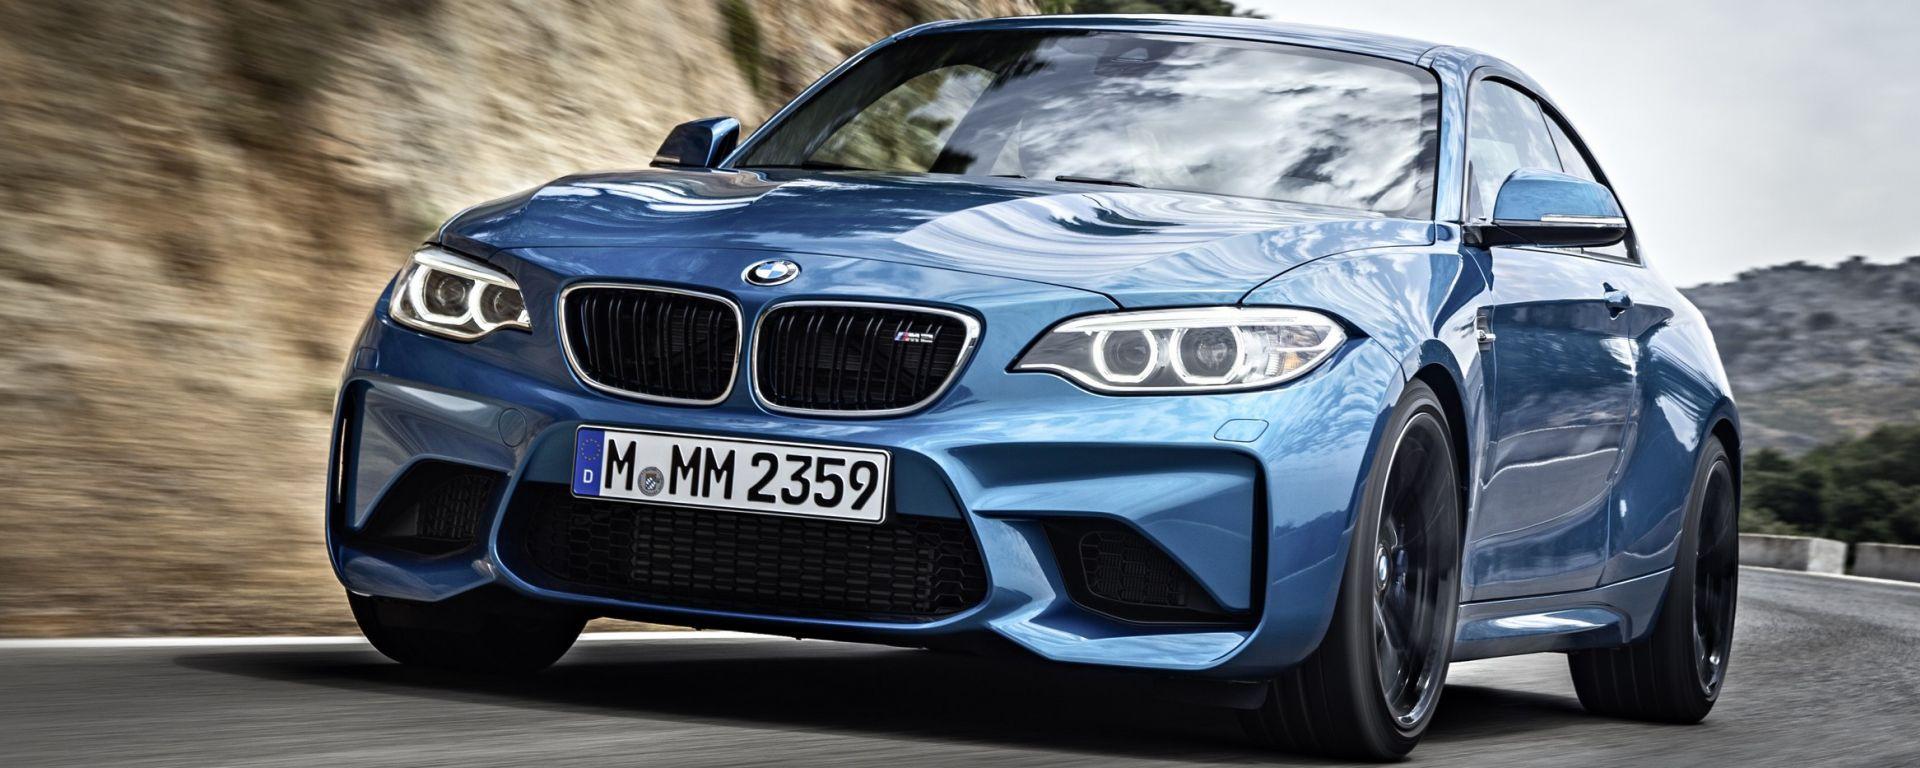 Nuova BMW M2 Competition: arriva ad aprile